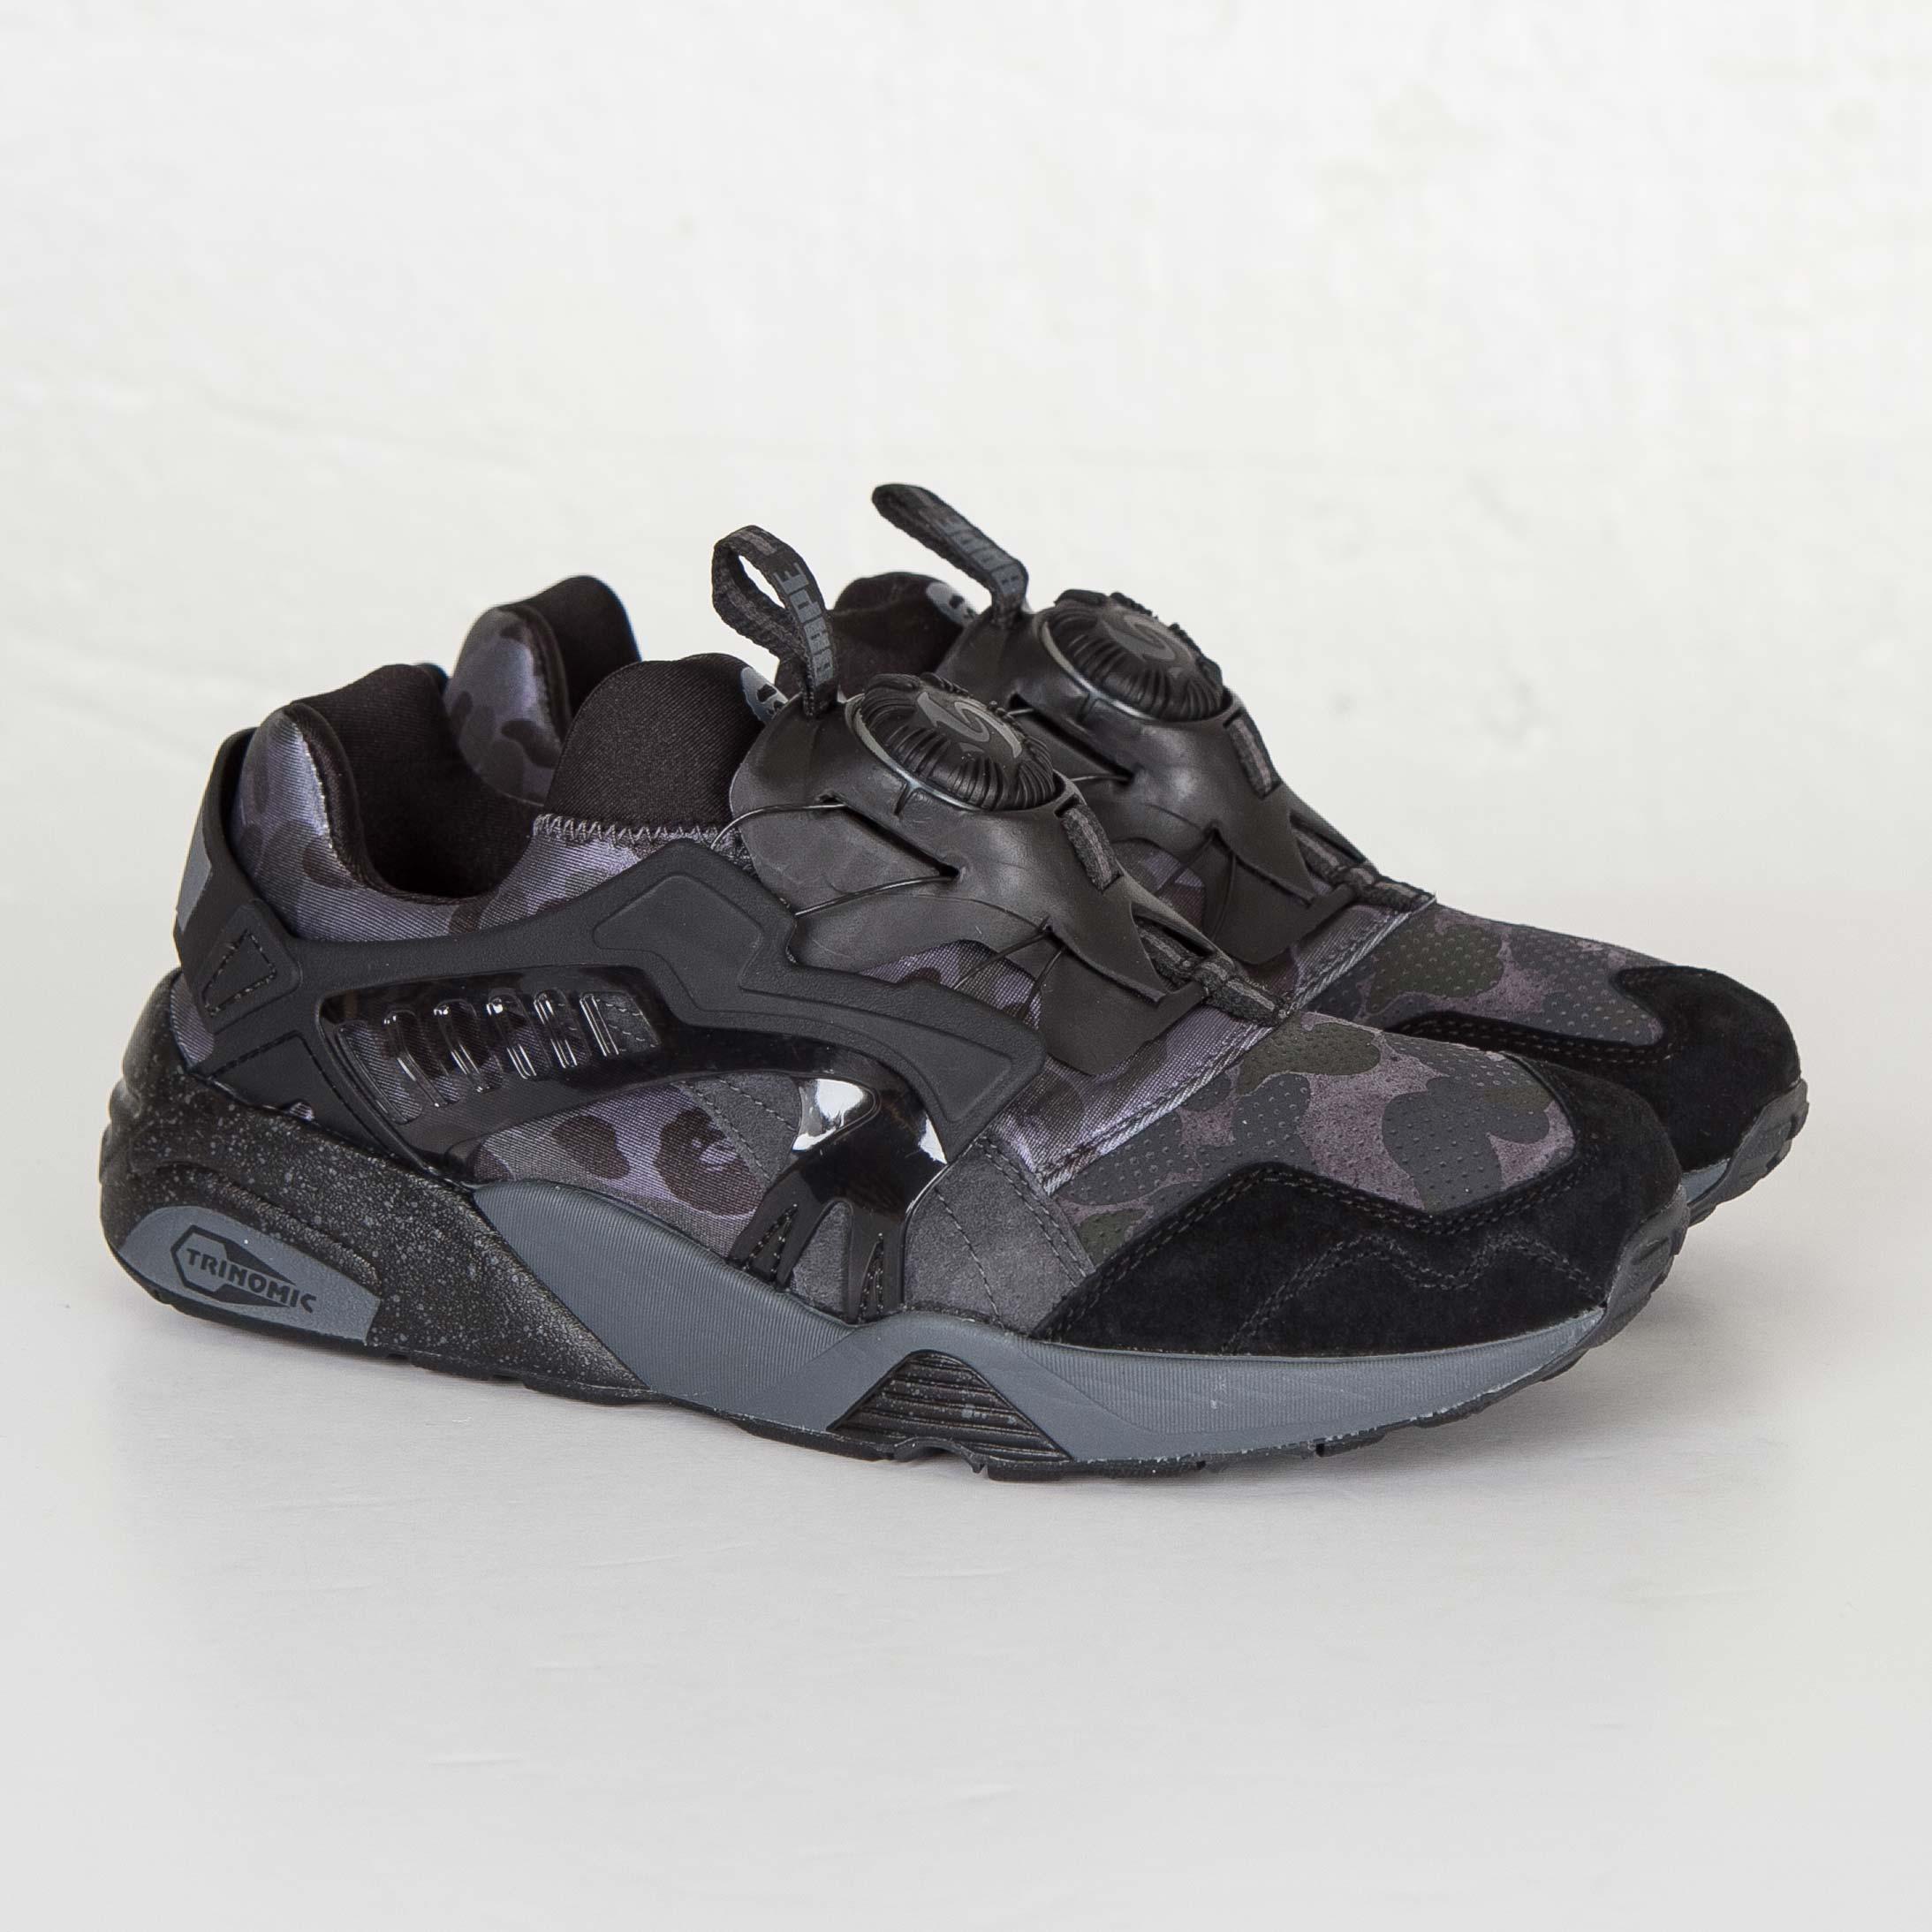 FENTY PUMA Abyss diamond low boot sneaker men white black UK 8 EU 42